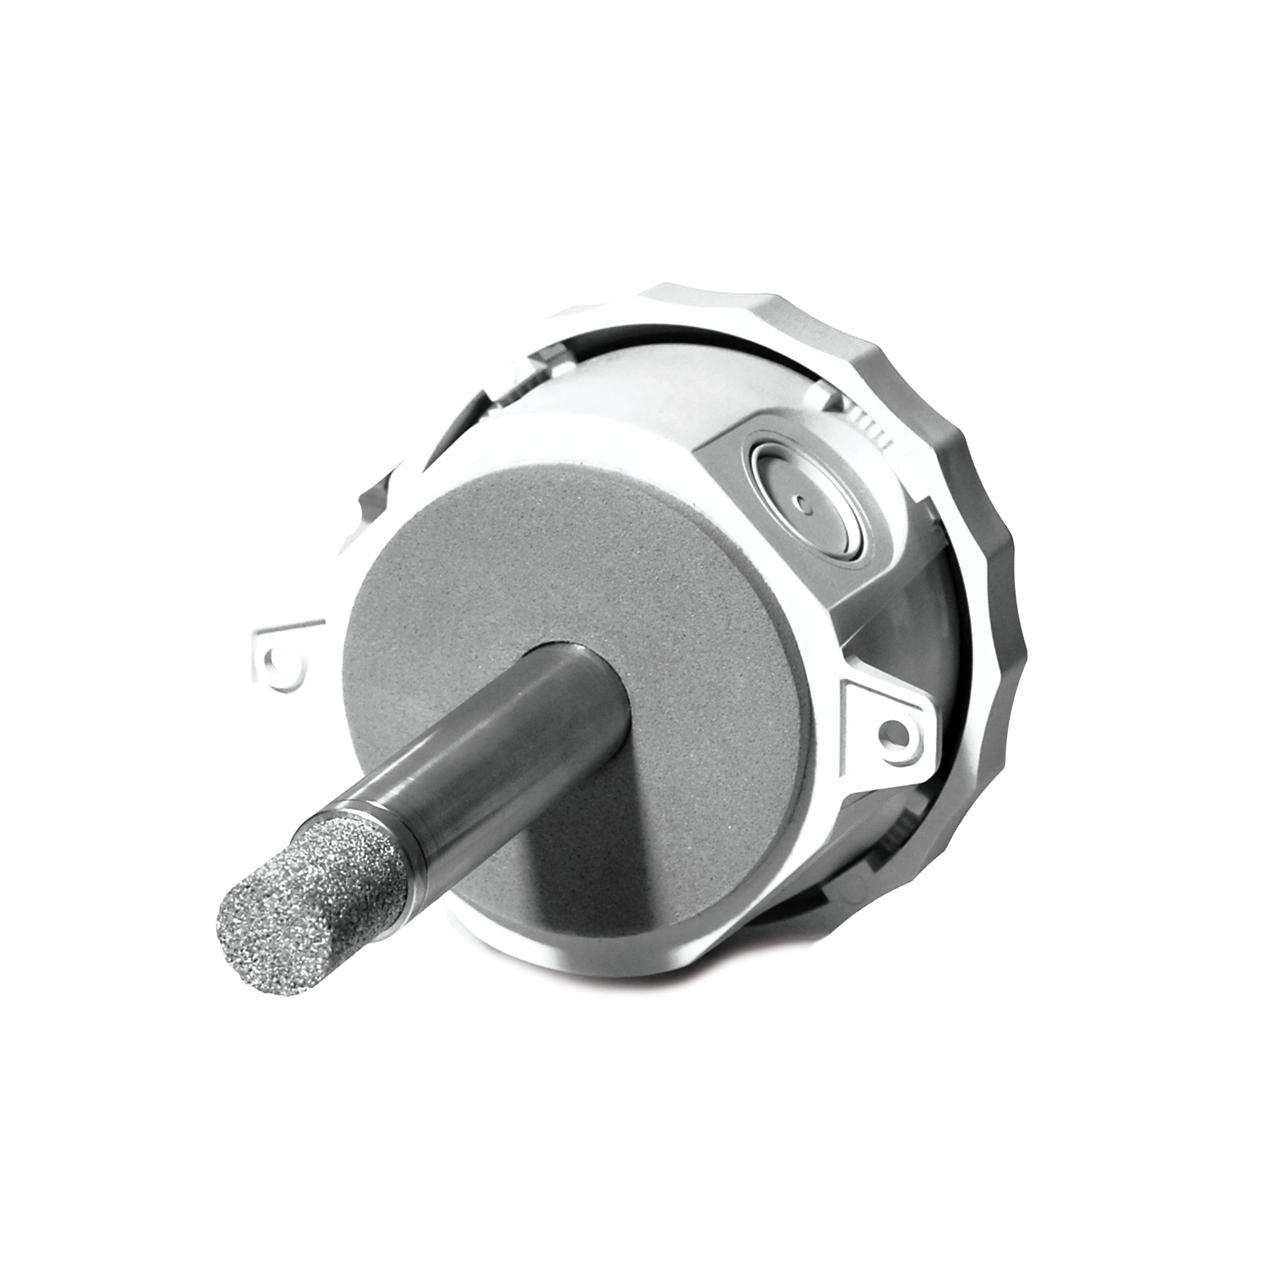 carrier-NSA-RH-DUCT-rh-duct-combo-sensor